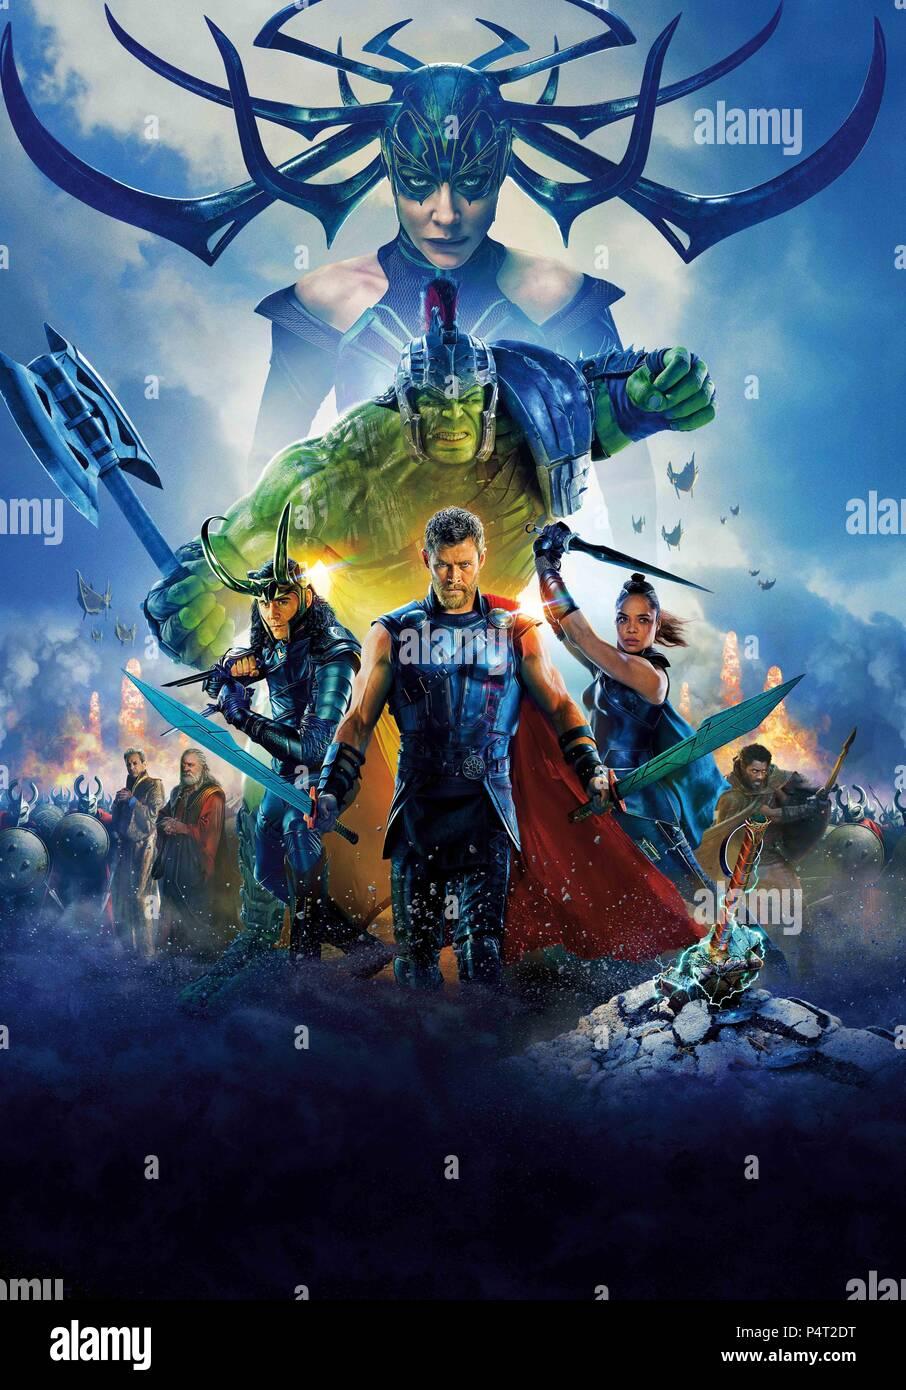 Original Film Title: THOR: RAGNAROK.  English Title: THOR: RAGNAROK.  Film Director: TAIKA WAITITI.  Year: 2017.  Stars: ANTHONY HOPKINS; MARK RUFFALO; JEFF GOLDBLUM; CATE BLANCHETT; IDRIS ELBA; TESSA THOMPSON; CHRIS HEMSWORTH; TOM HIDDLESTON. Credit: MARVEL STUDIOS/WALT DISNEY PICTURES / Album - Stock Image